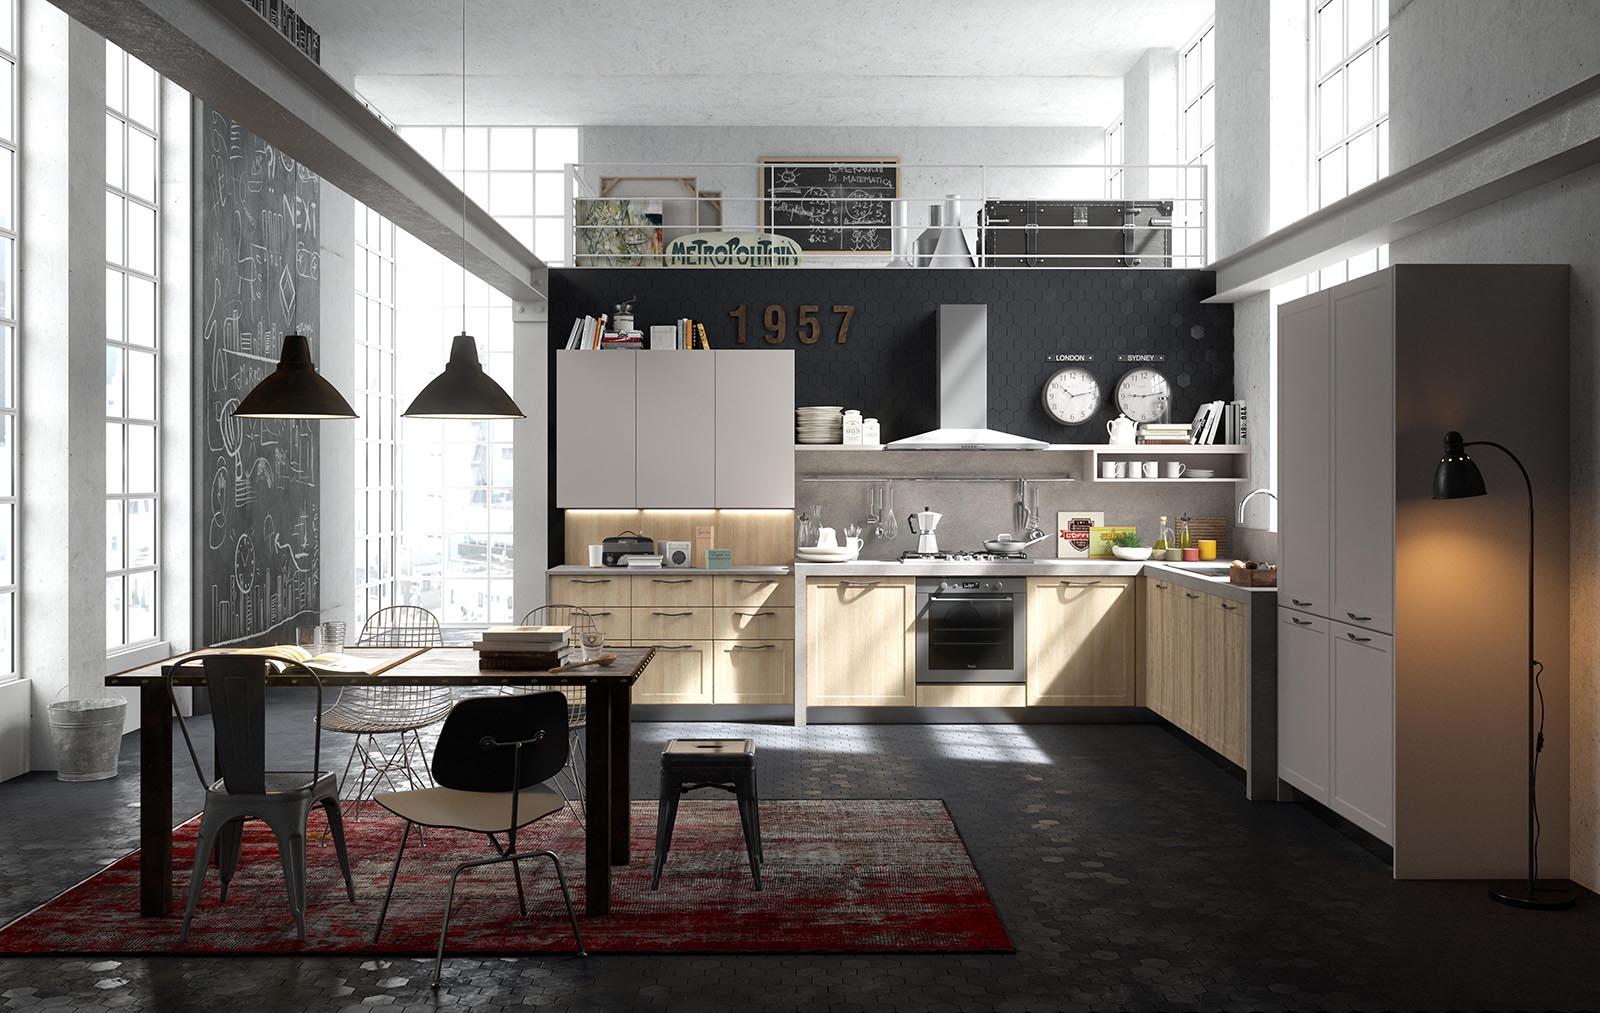 spesso Stunning Cucina Industriale Prezzi Photos - Ideas & Design 2017  OK33